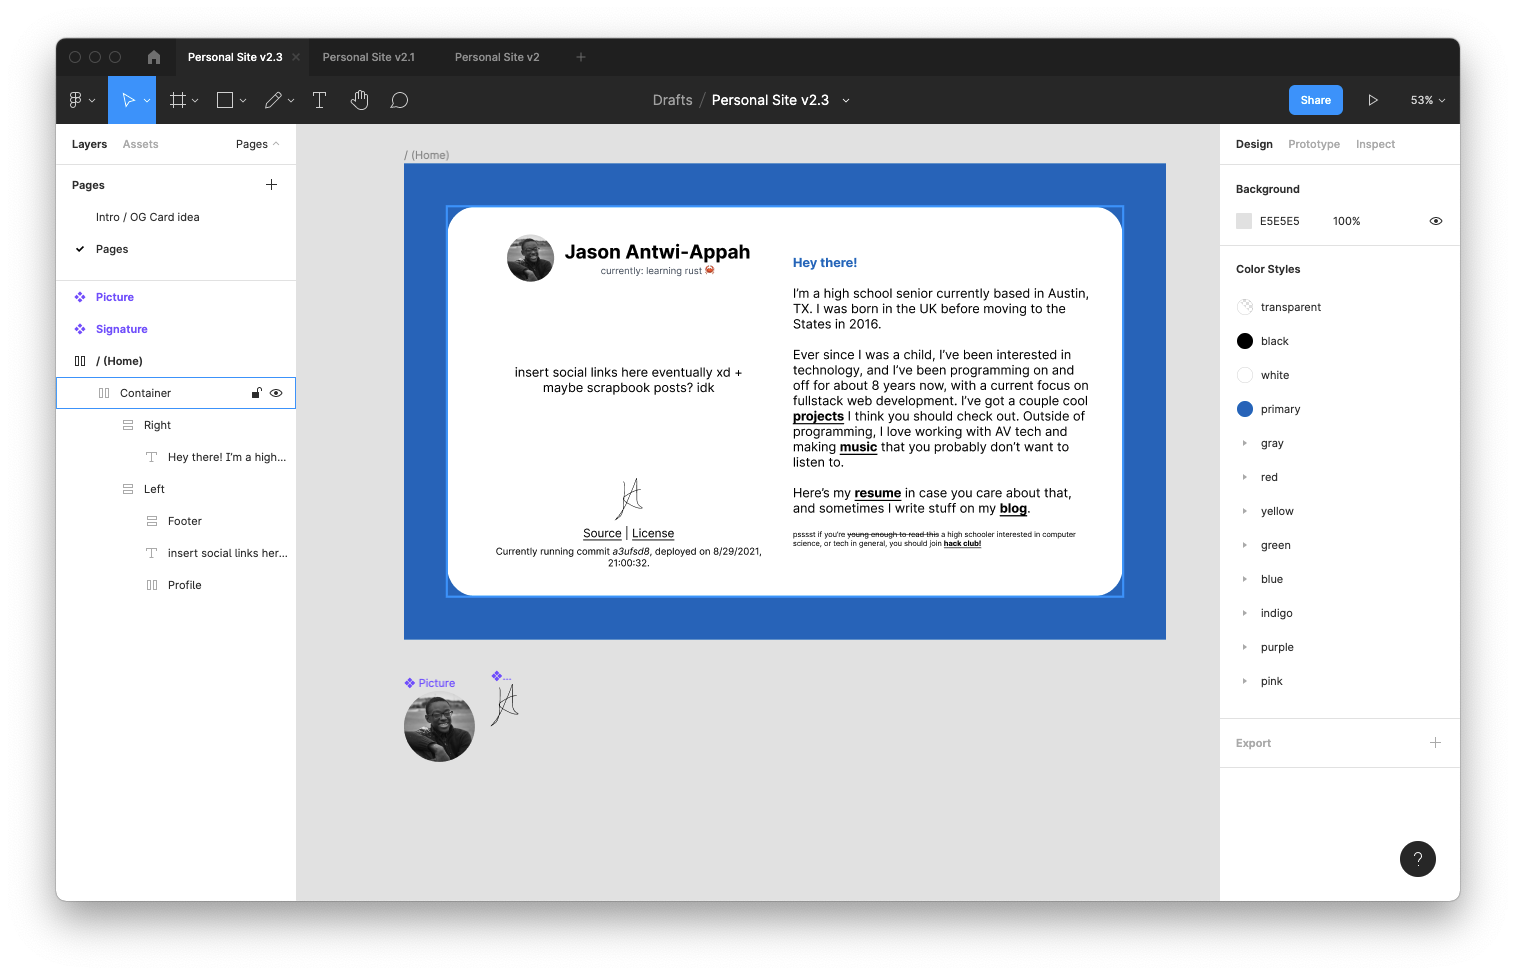 https://cloud-nuhlx2wn2-hack-club-bot.vercel.app/0image.png